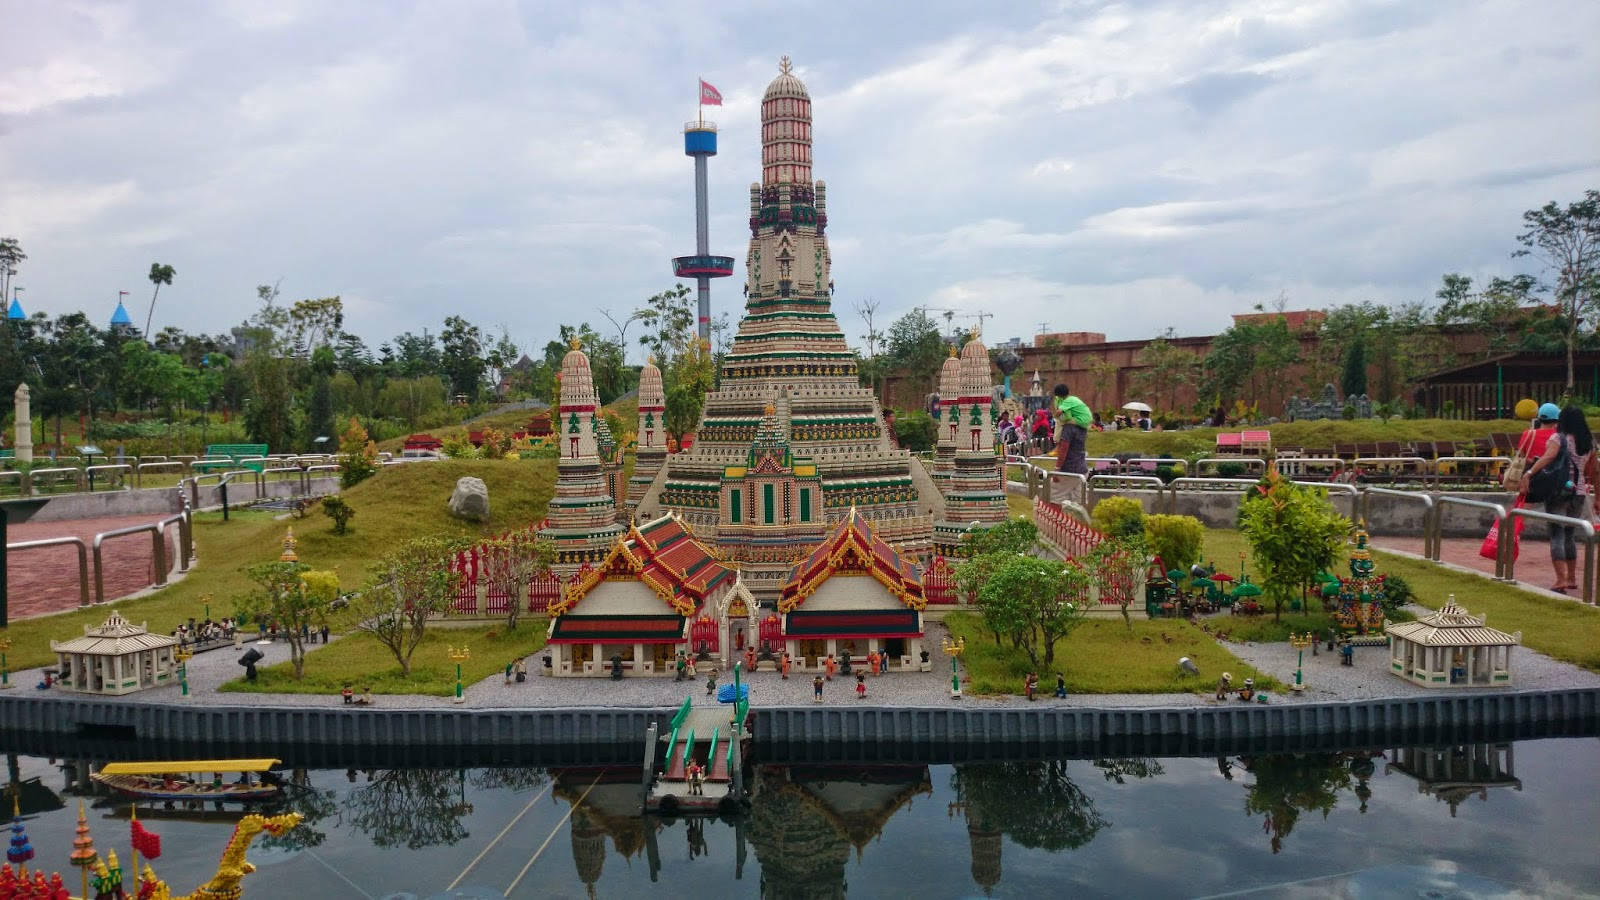 Lifestyle At 50 S Legoland Mini City